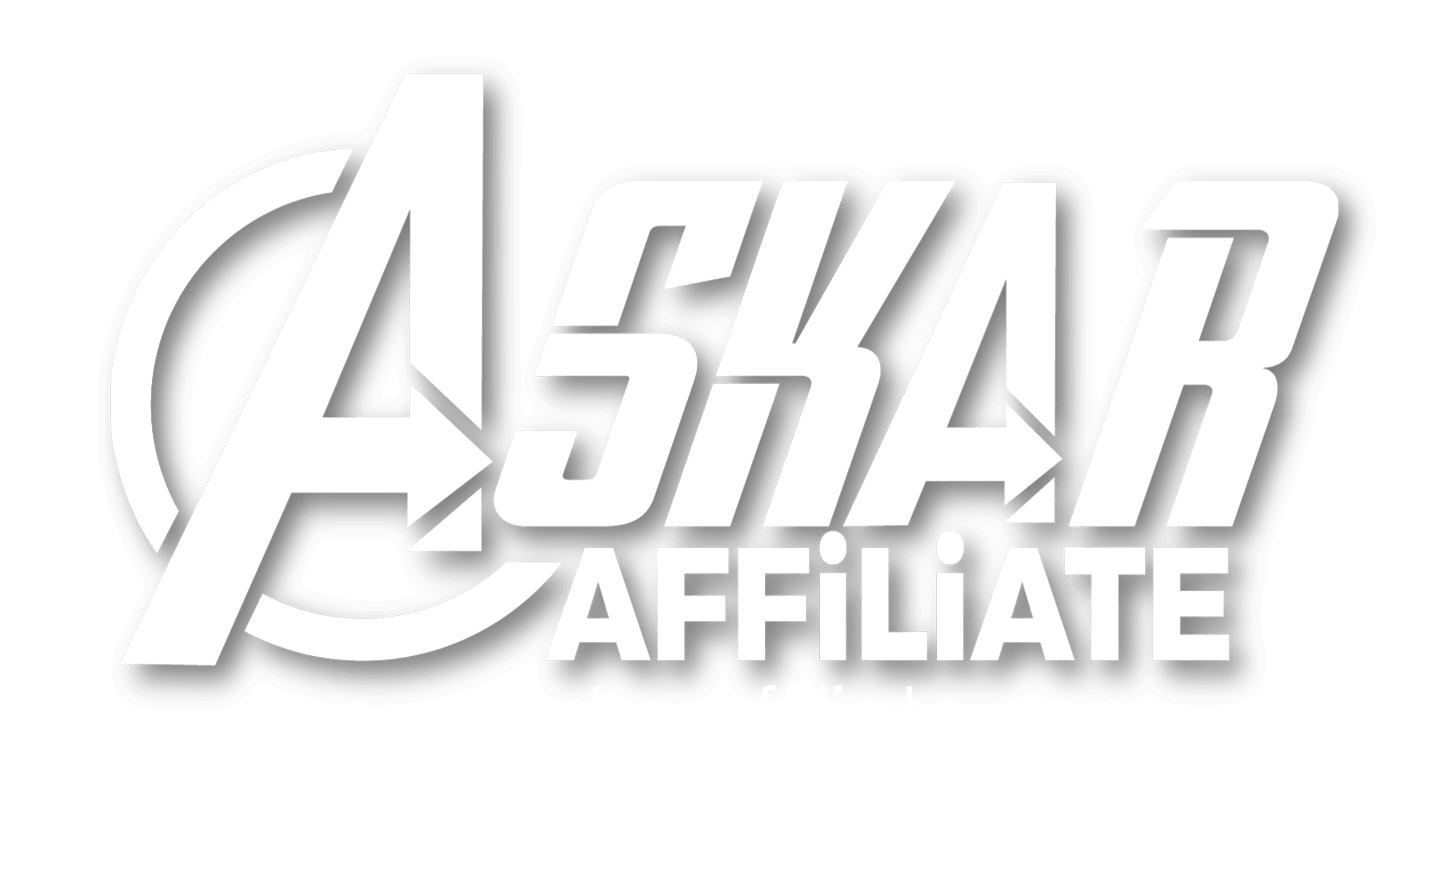 AskarAffiliate.com